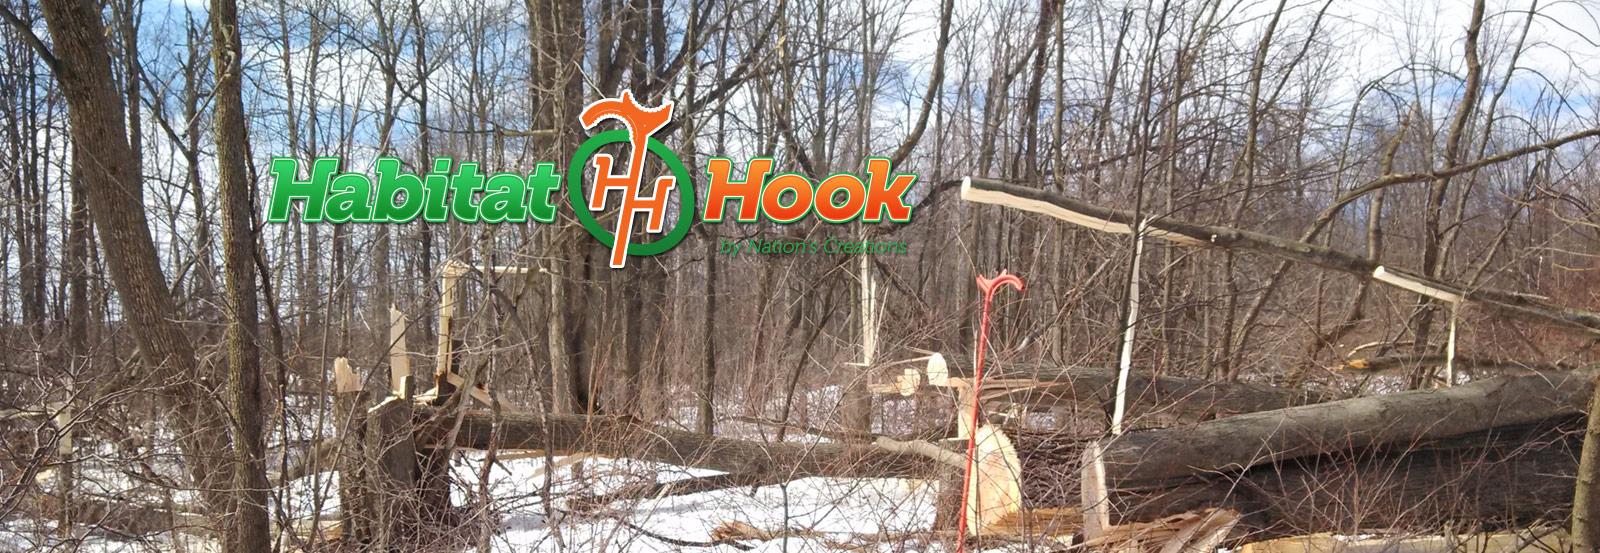 Hinge Cutting With The Habitat Hook